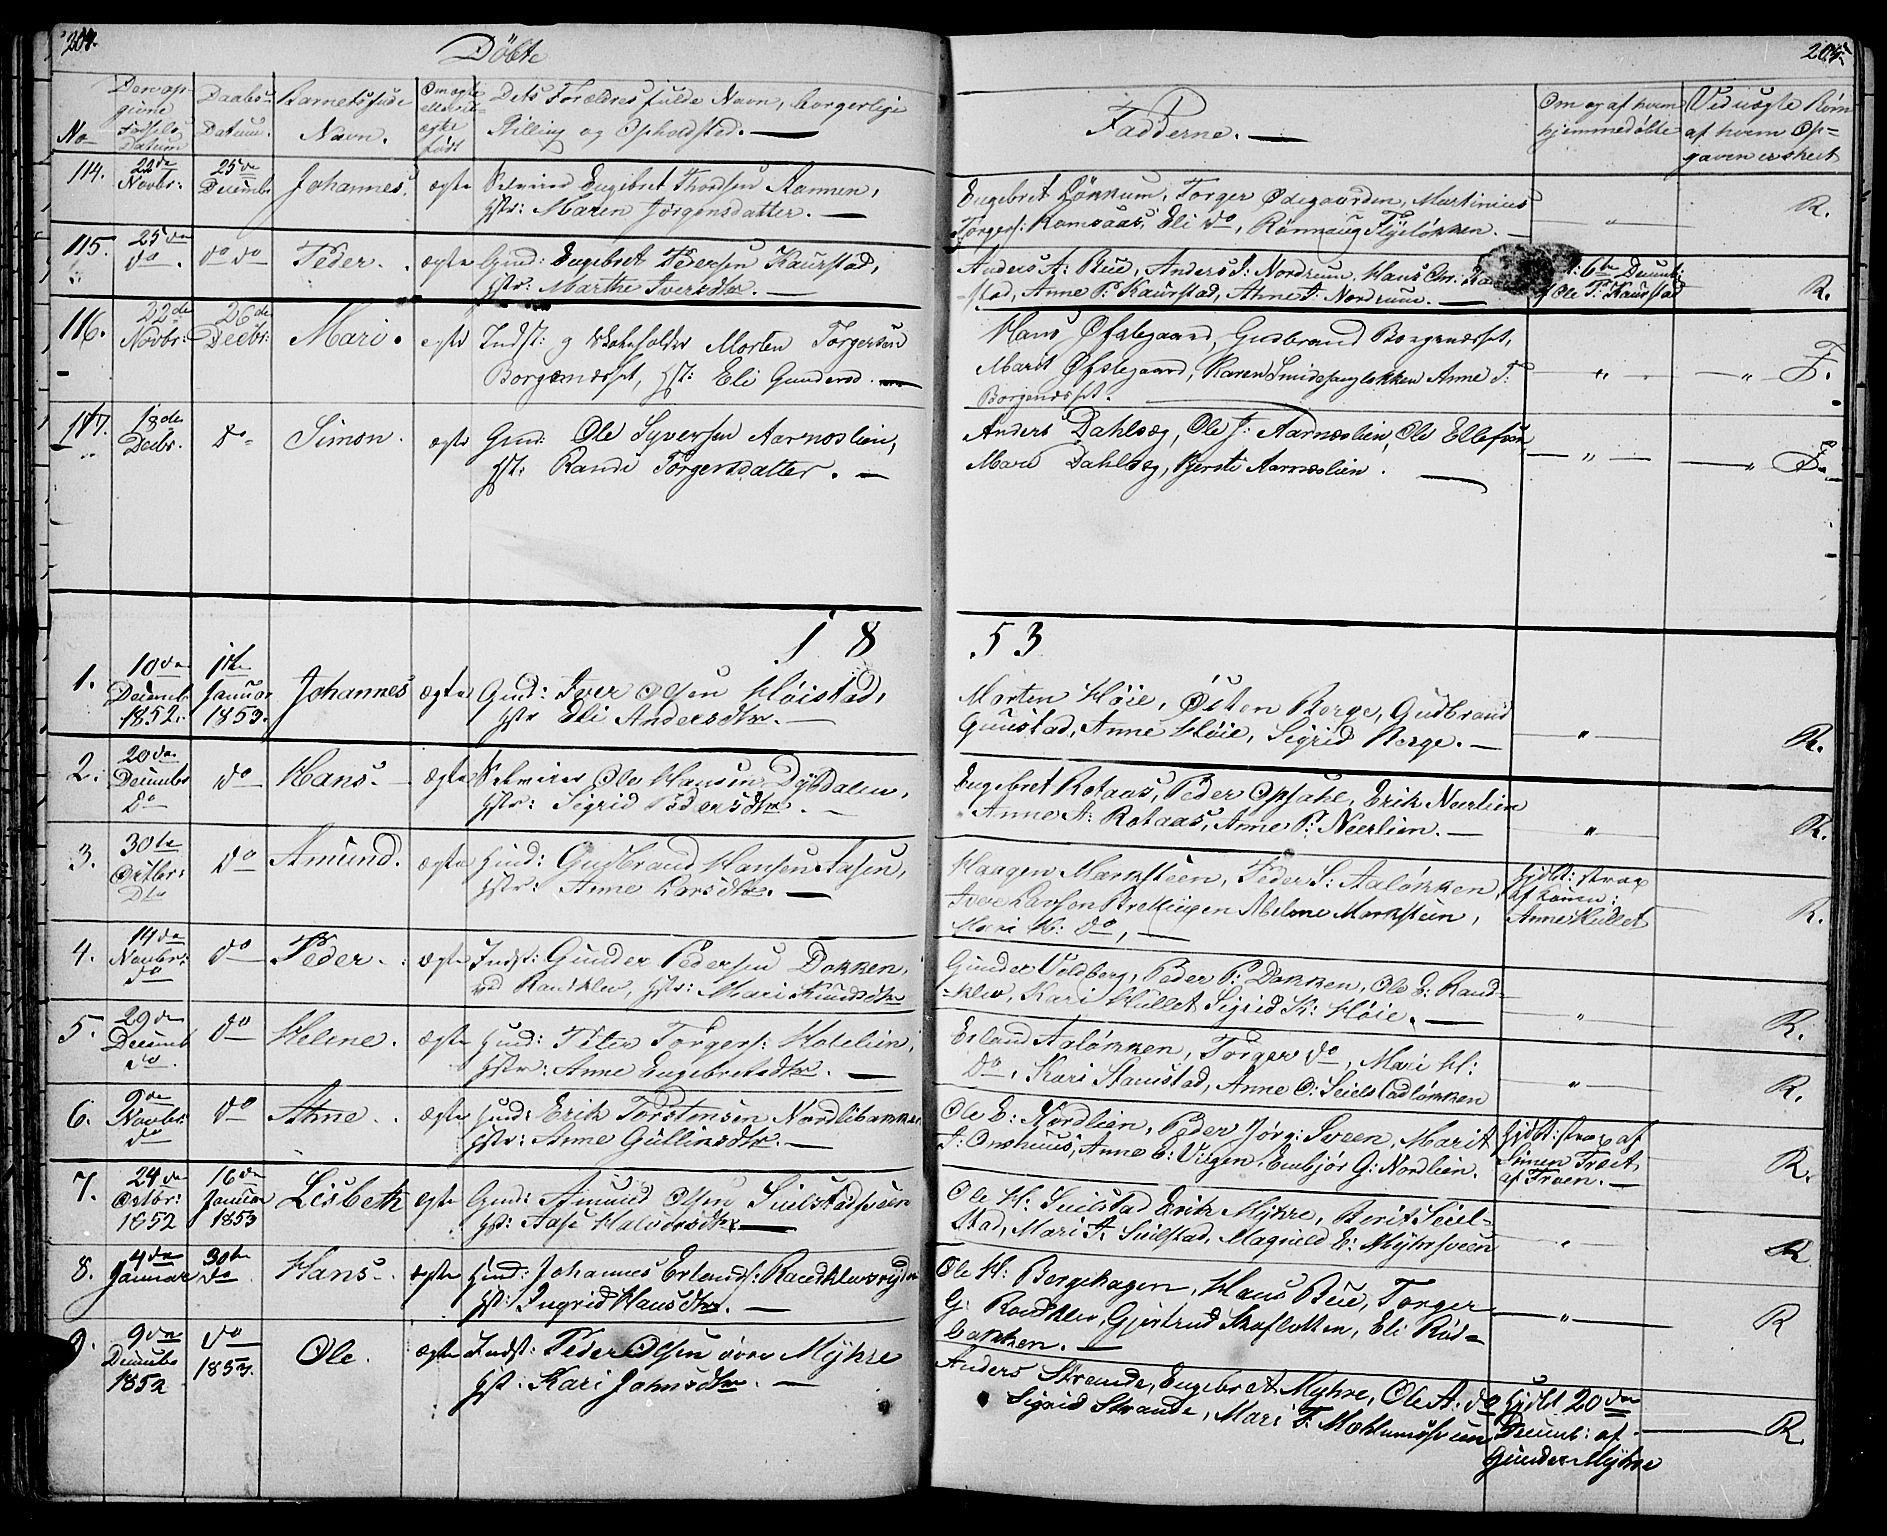 SAH, Ringebu prestekontor, Klokkerbok nr. 2, 1839-1853, s. 204-205